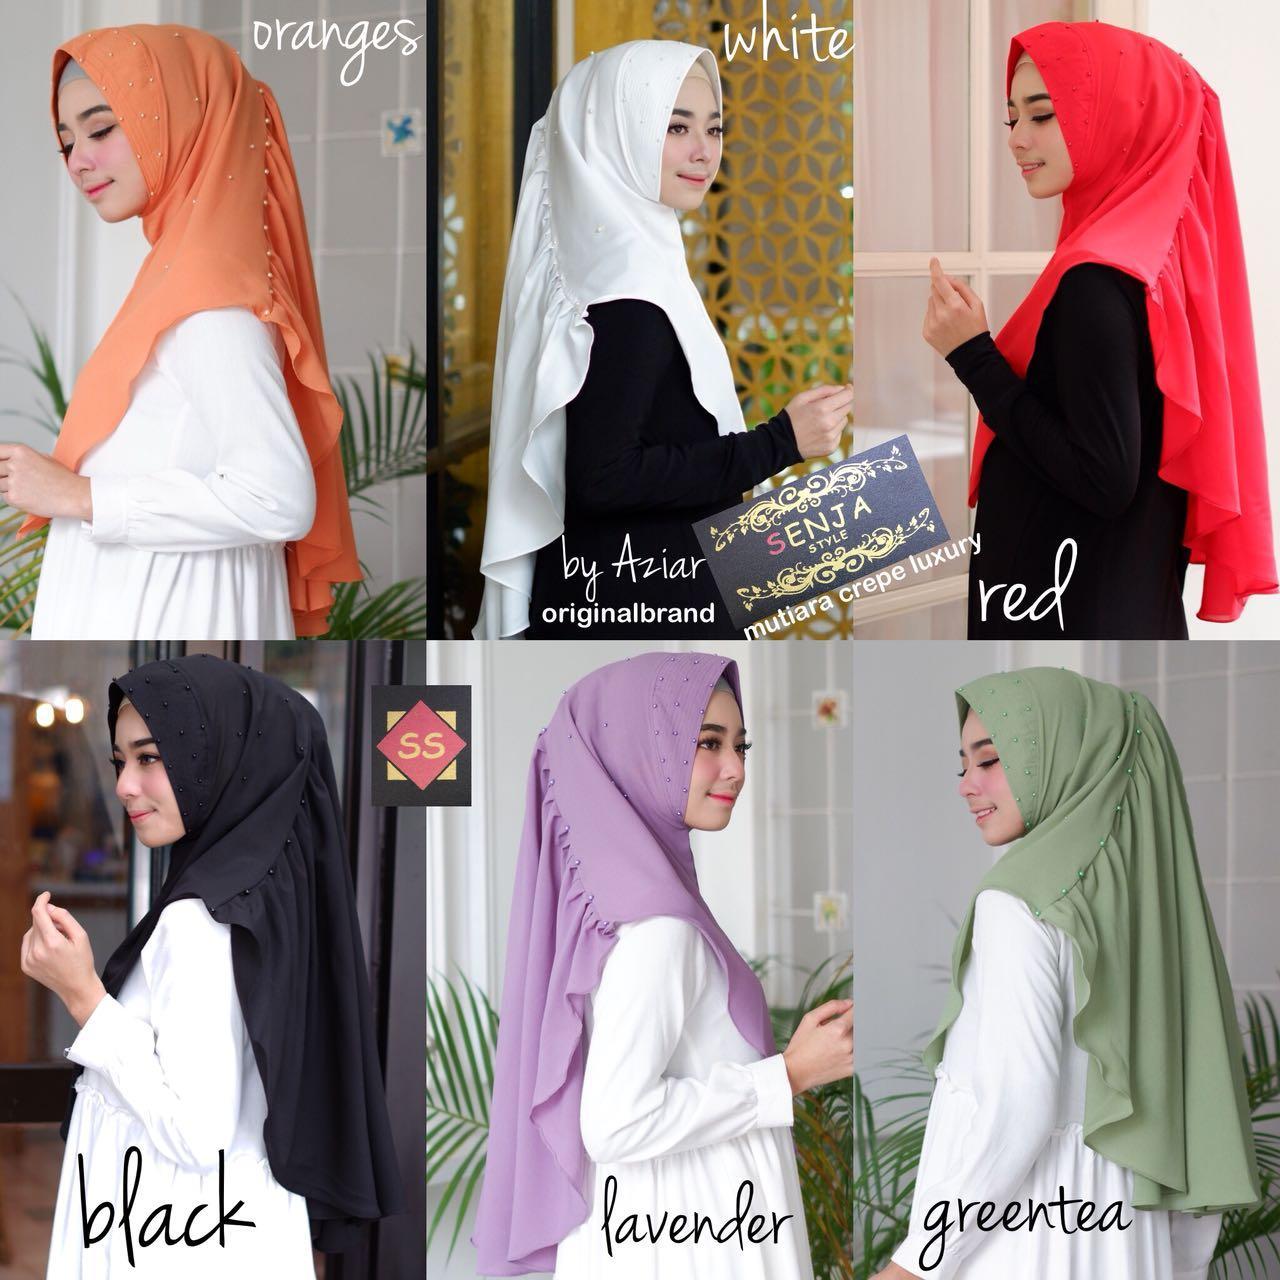 Harga Jual Gamis Murah Harnis Syari 140000 Hijab Janela Hijablana Aulia Tunik Atasan Instan Lazmy Mutiara Dusty Jilbab Pashmina Fashion